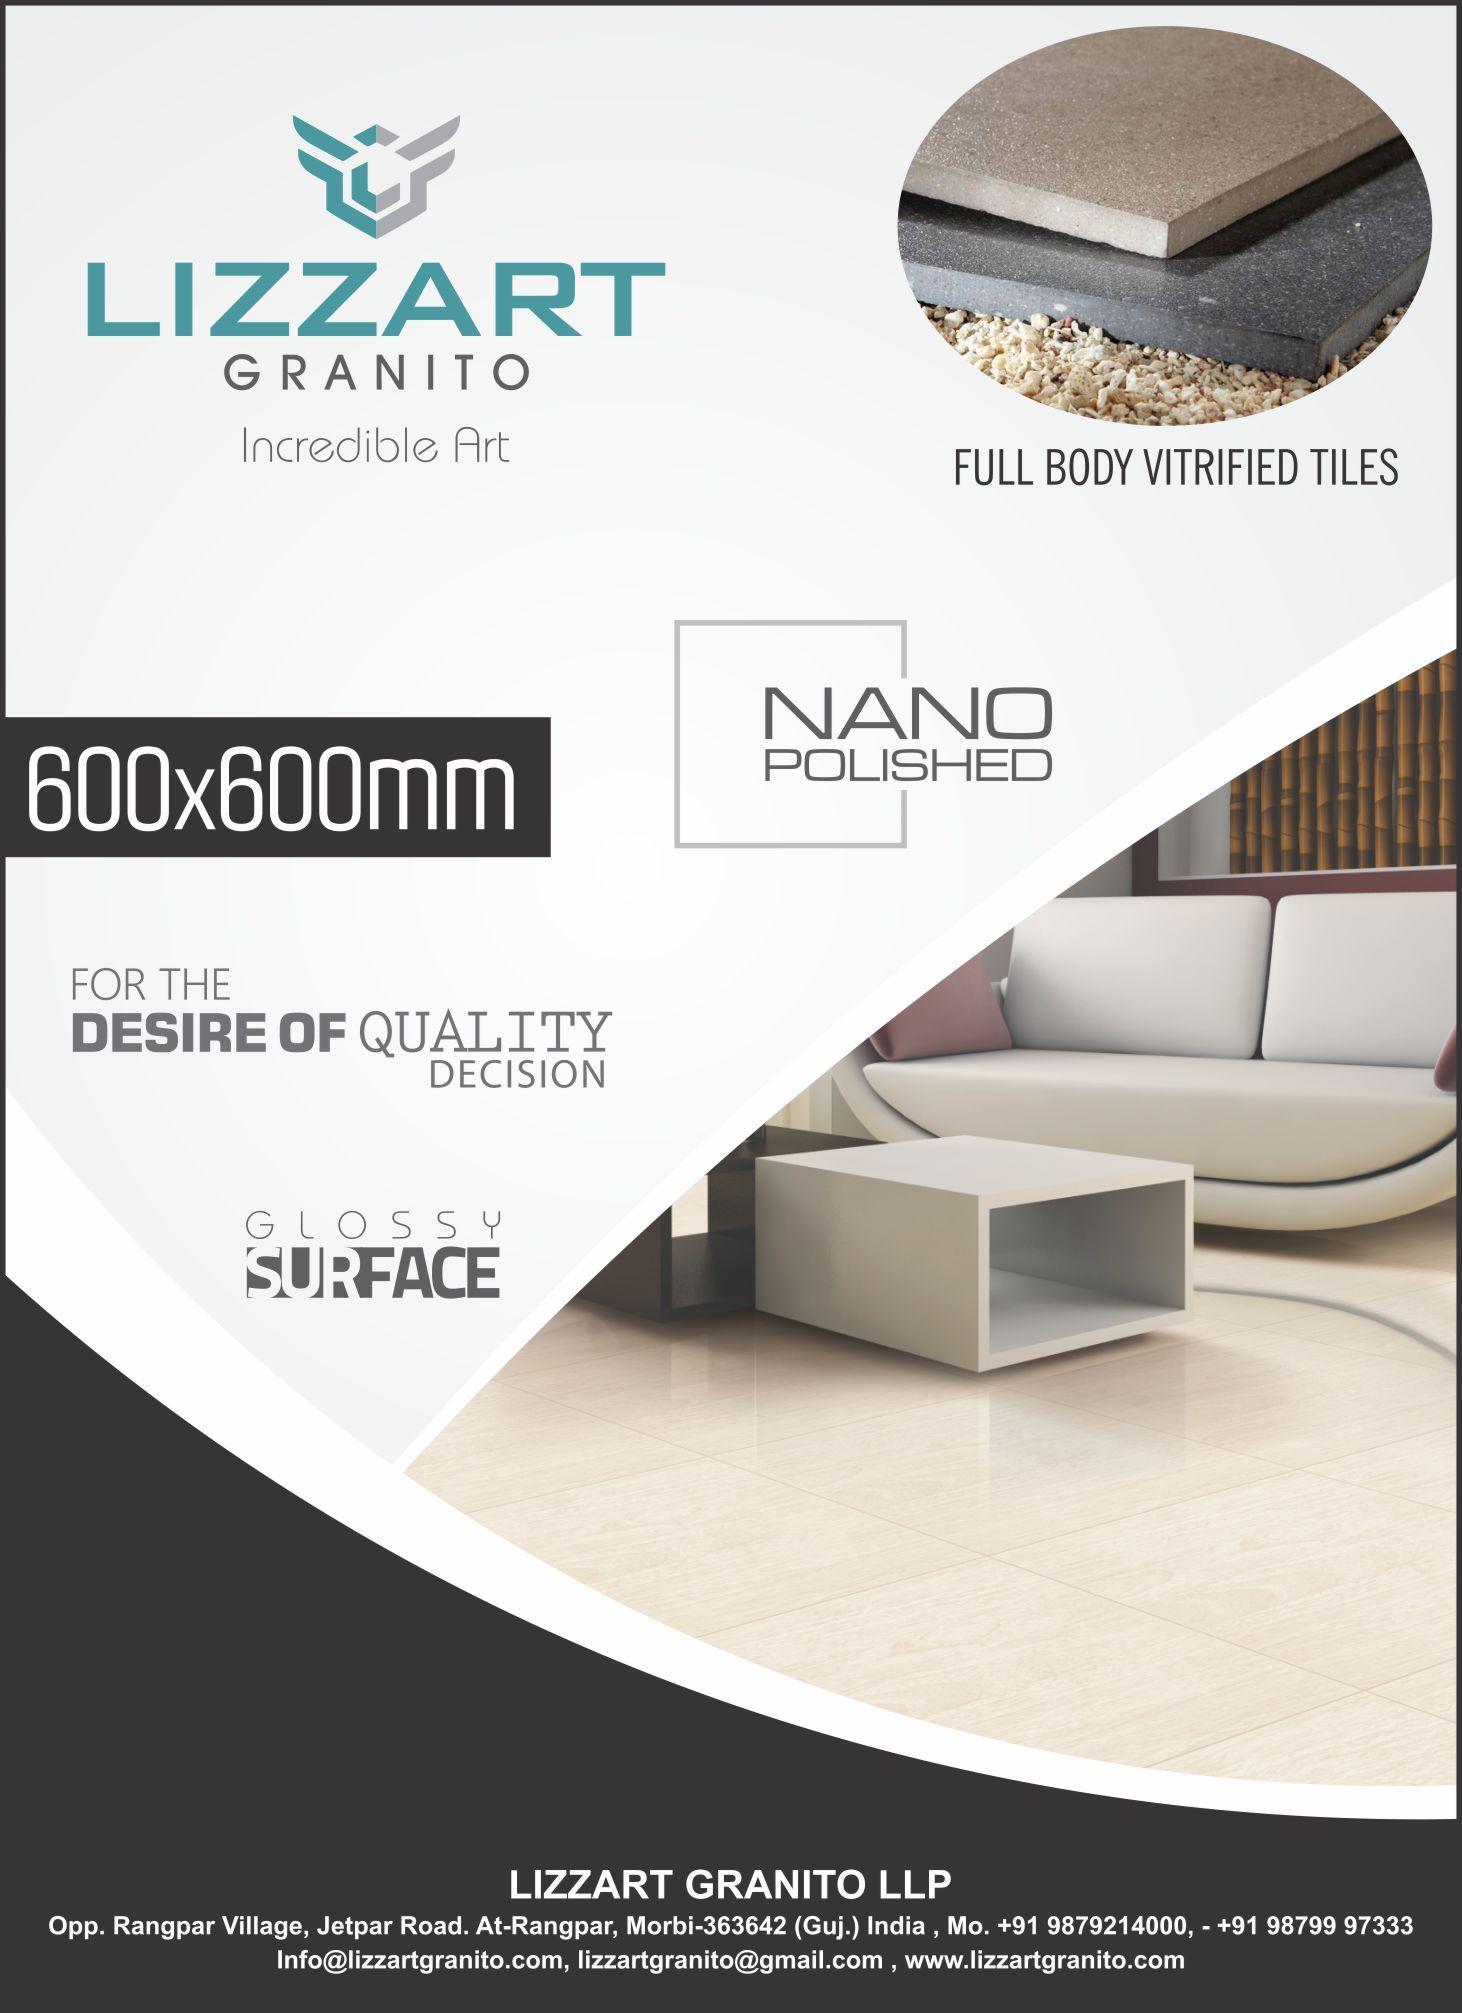 Gujarat Tiles Nano Vitrified Tiles In 2020 Vitrified Tiles Ceramic Floor Tiles Tiles Price